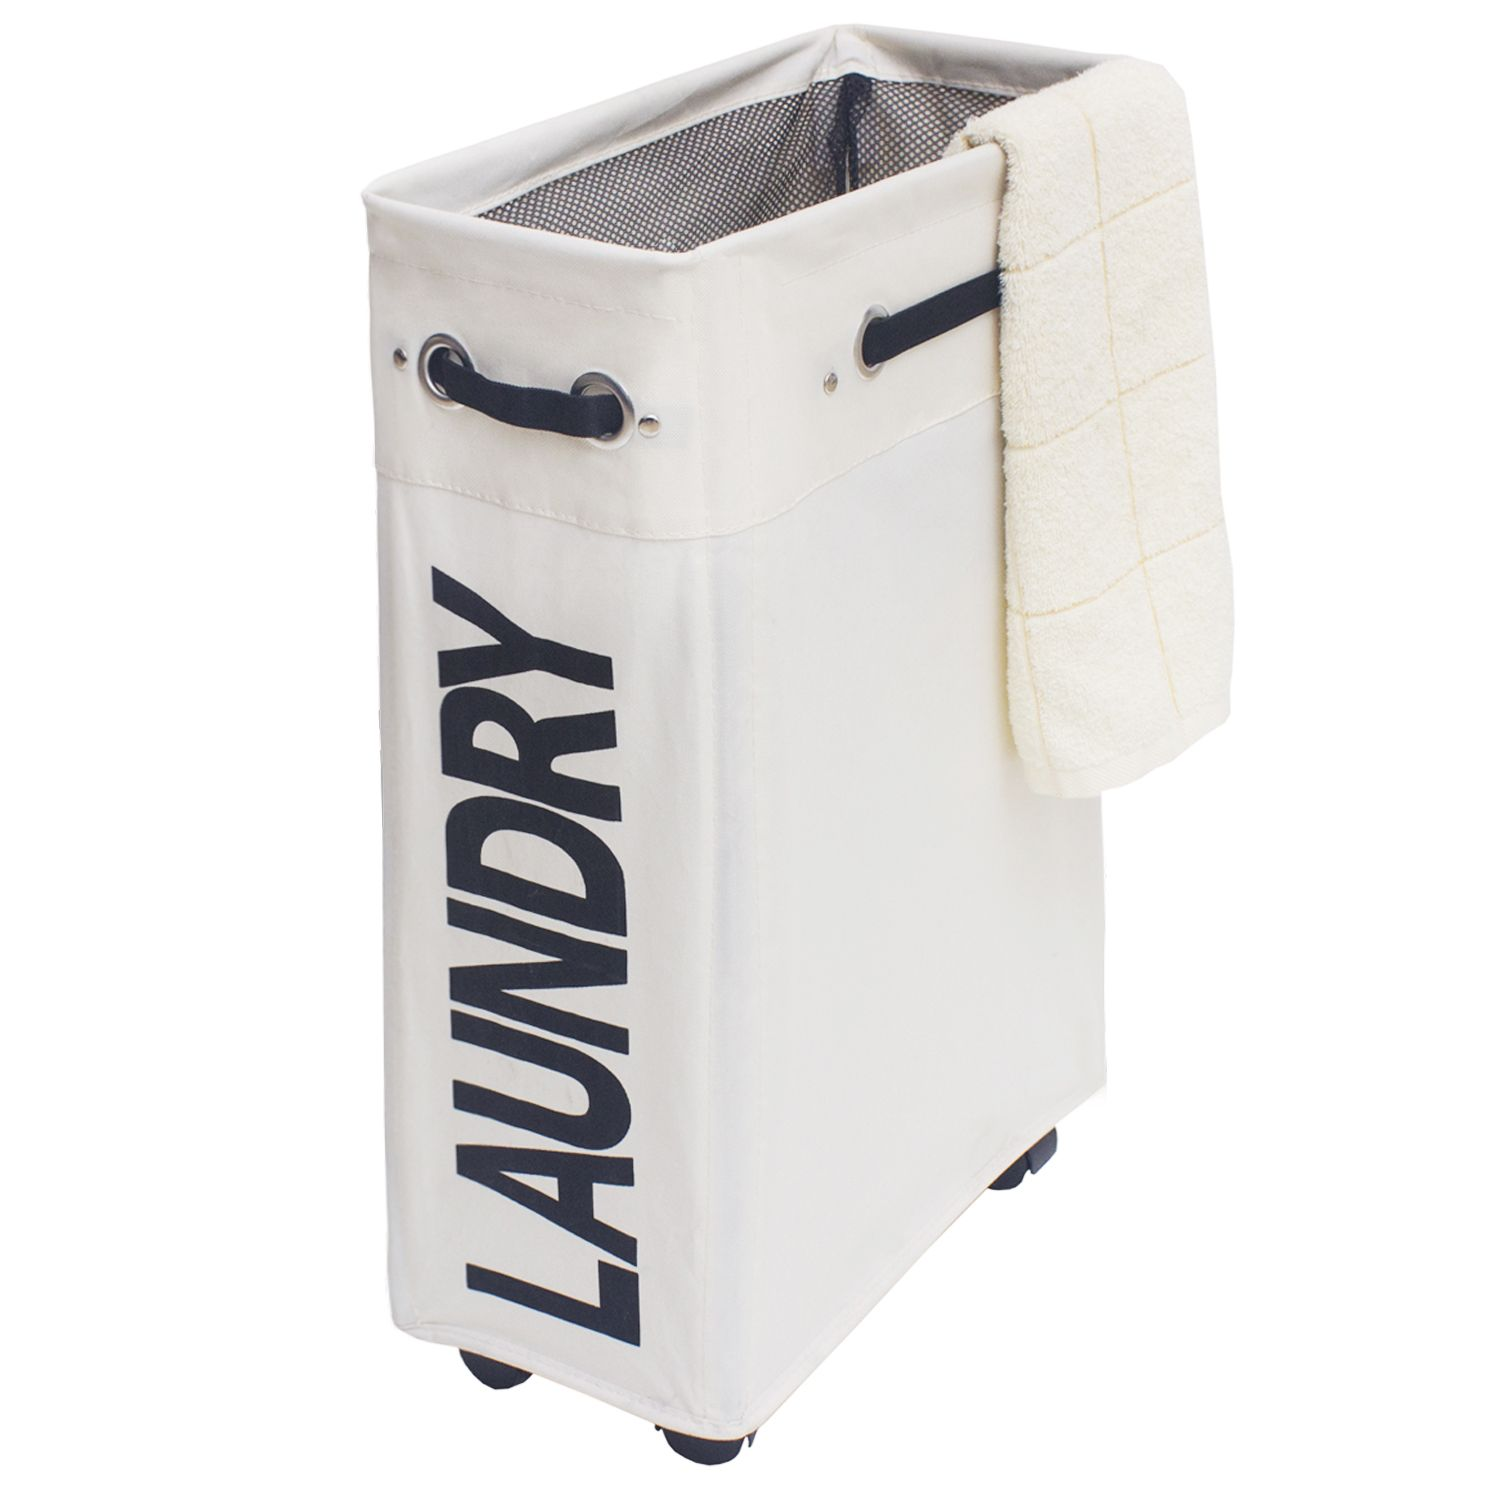 Laundry Basket On Wheels 24 Slim Laundry Hamper